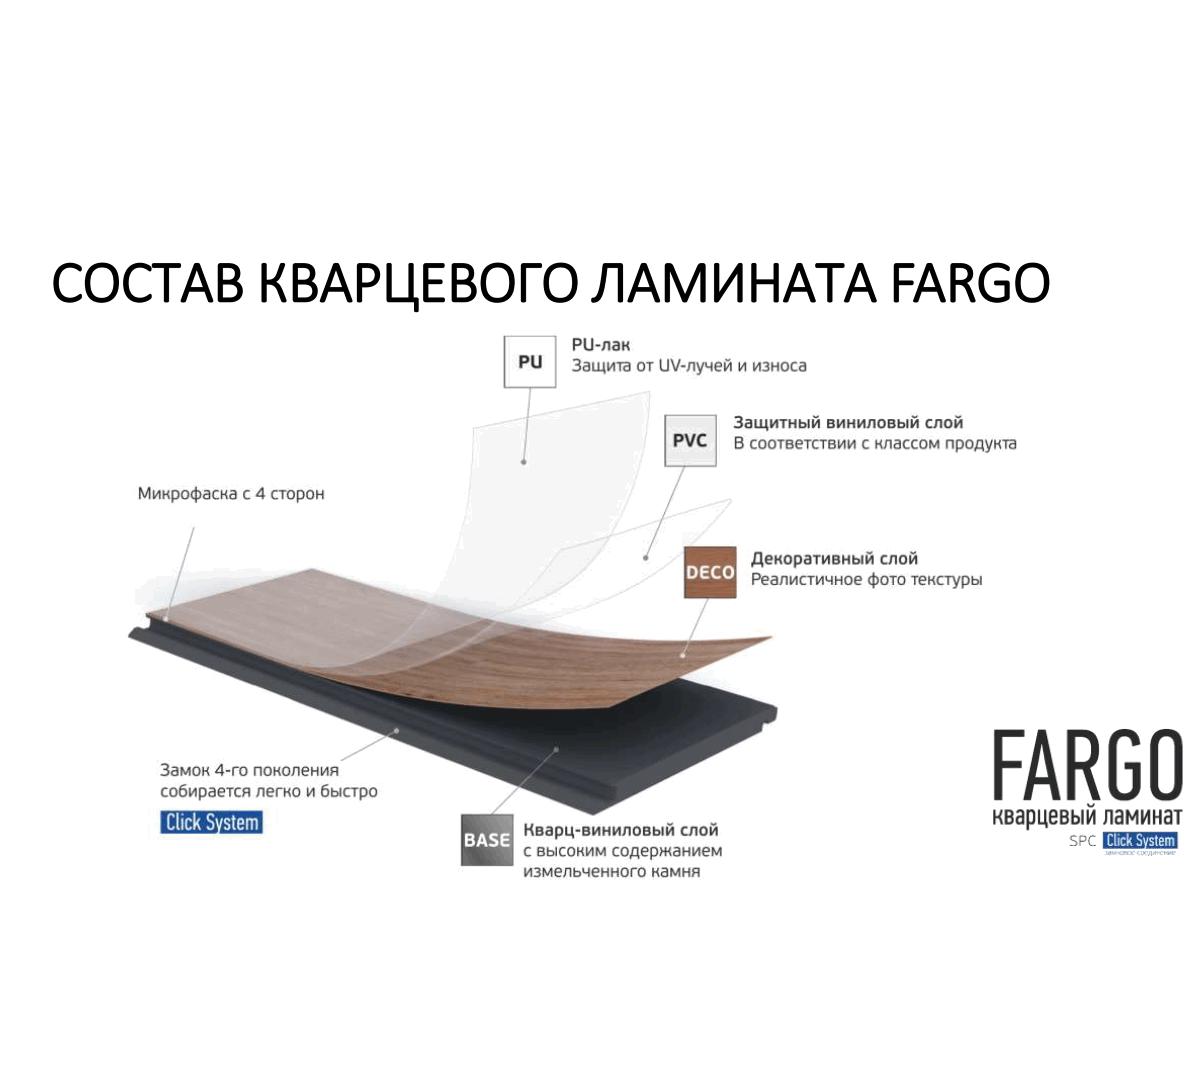 "Кварцевый ламинат SPC Fargo Comfort JC 18001-28 ""Дуб Старый"" (1220*180*4 мм) 10шт/2,196м2"